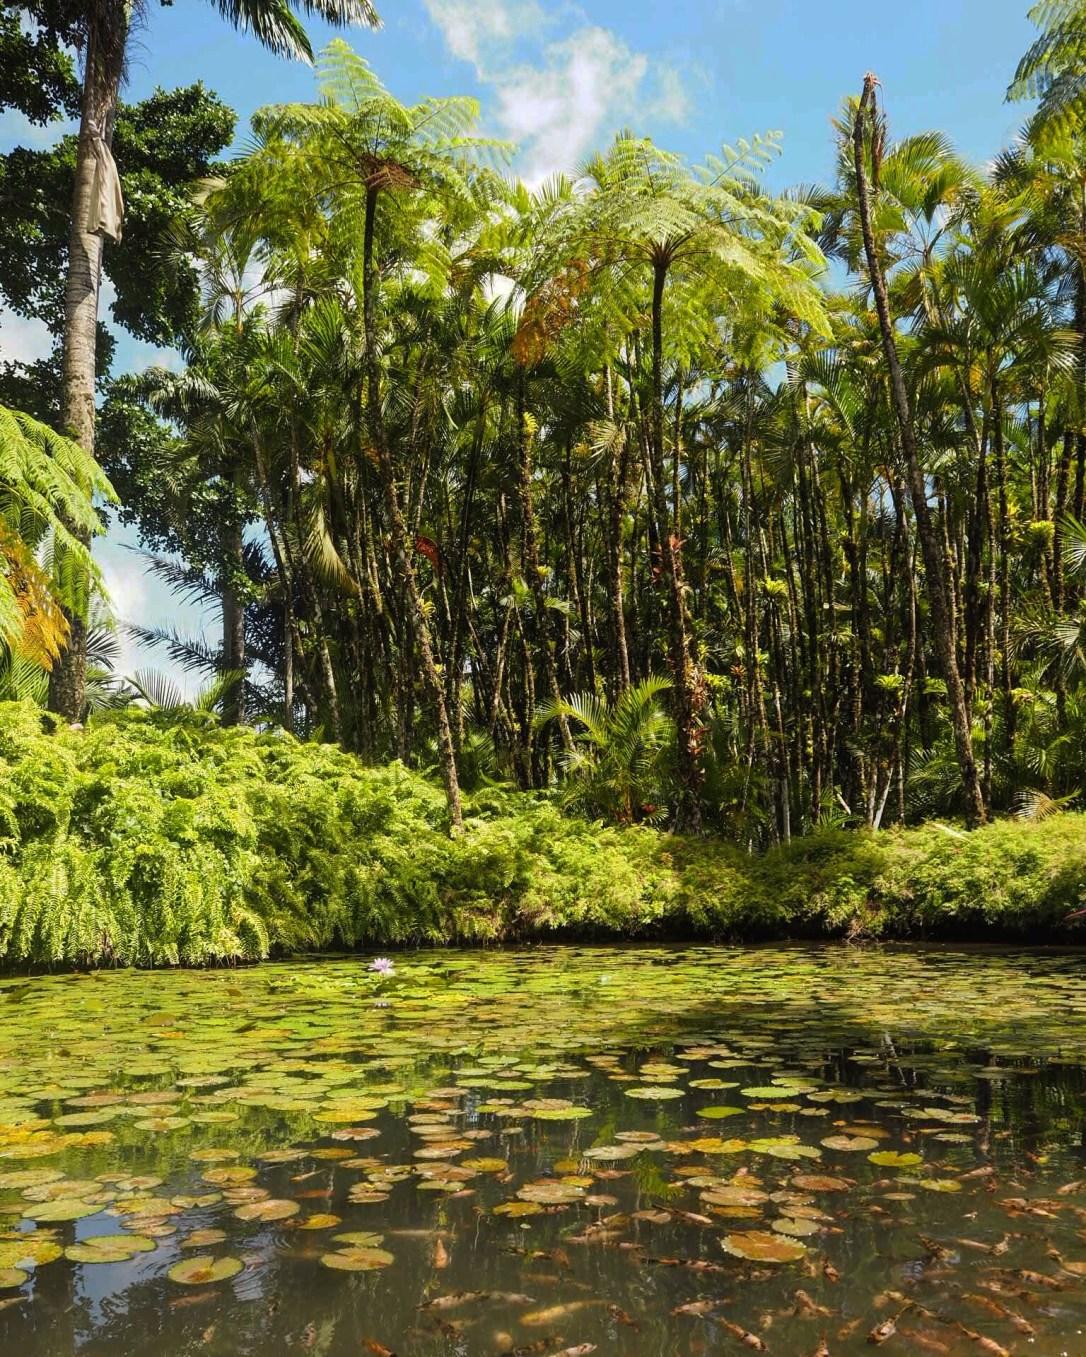 The pond at the botanic garden Jardin de Balata in Martinique